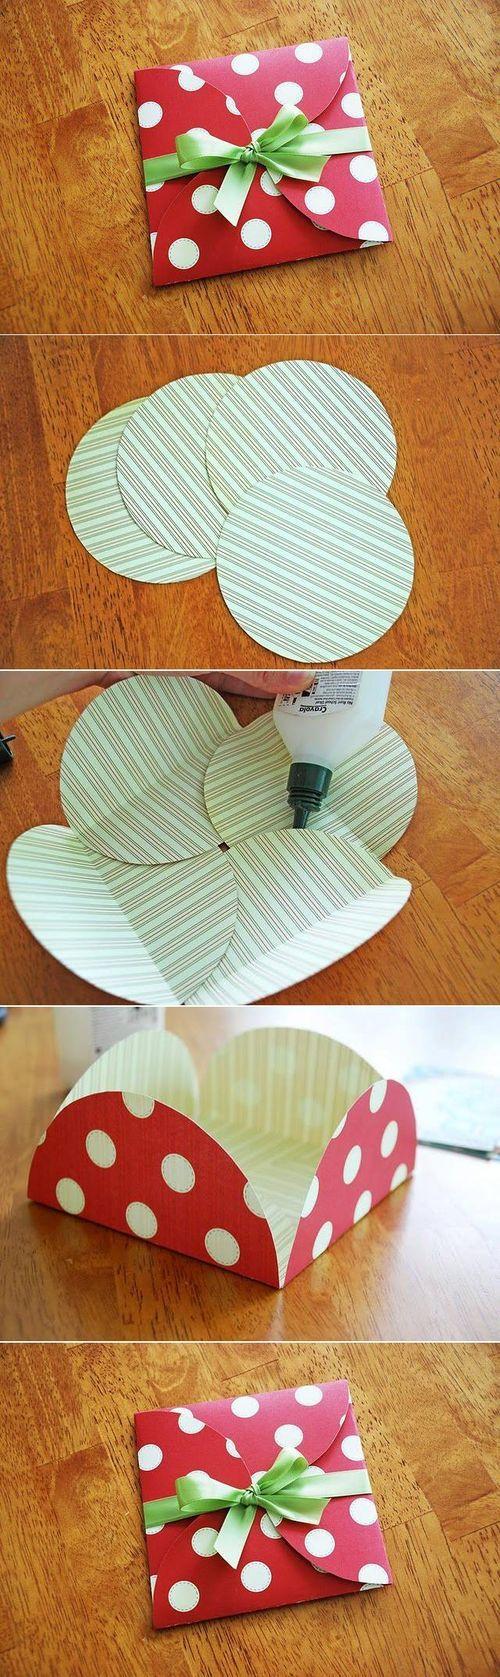 DIY Simple Beautiful Envelope DIY Projects / UsefulDIY.com